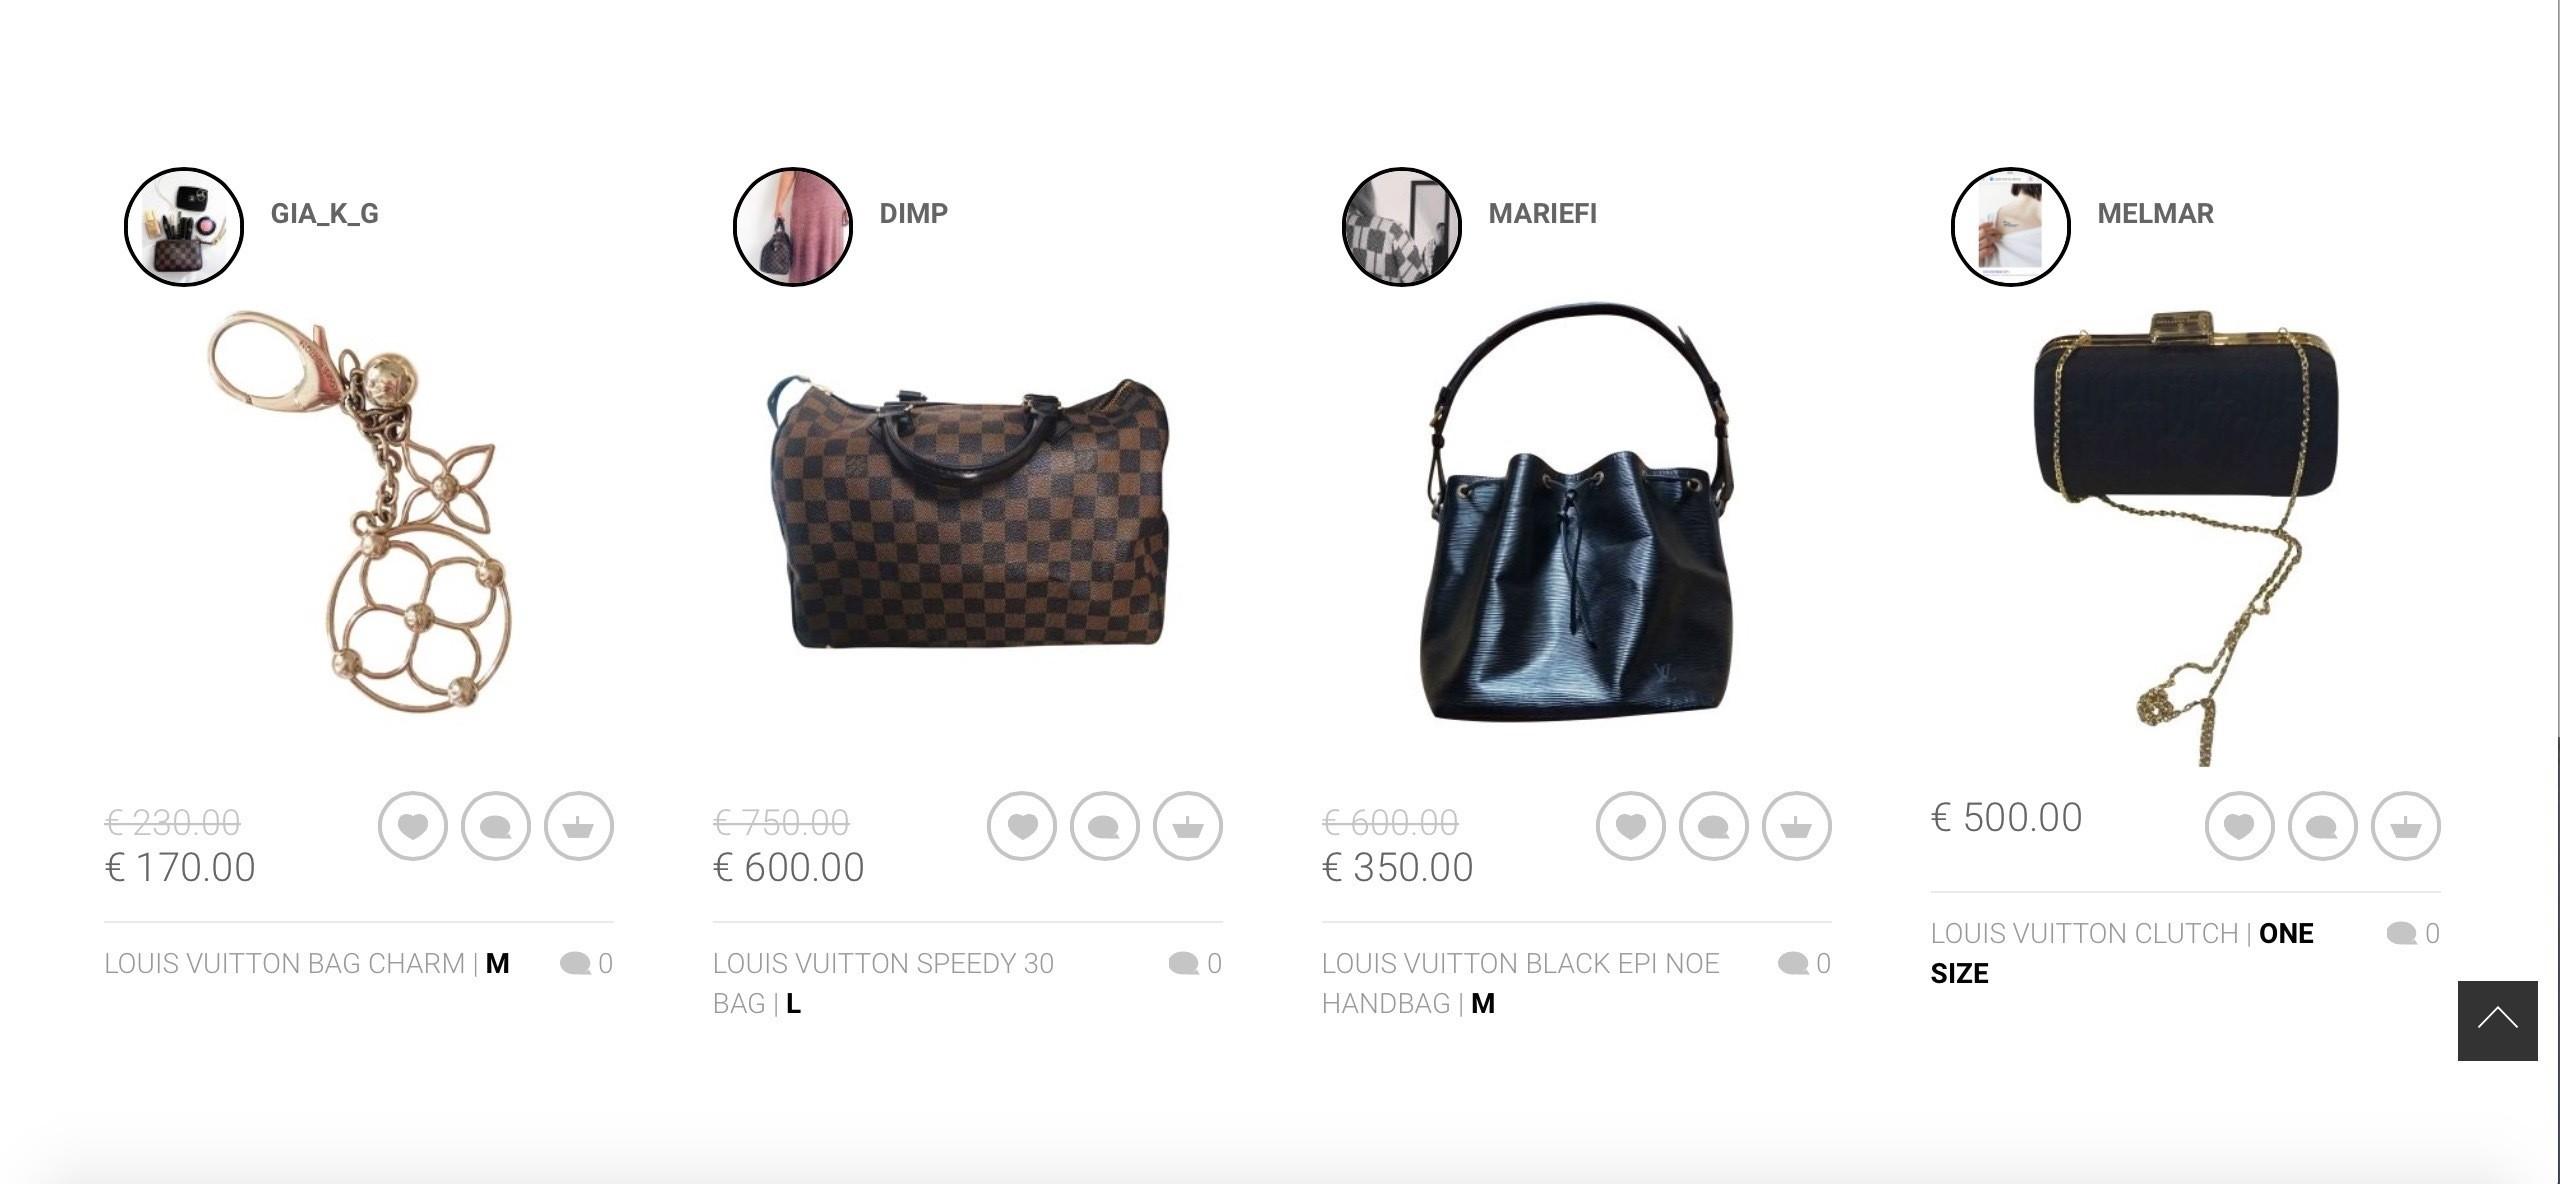 20ebd7db3e Από τα Burberry στα Chanel  Στην Ελλάδα της κρίσης τρεις εταιρείες ...